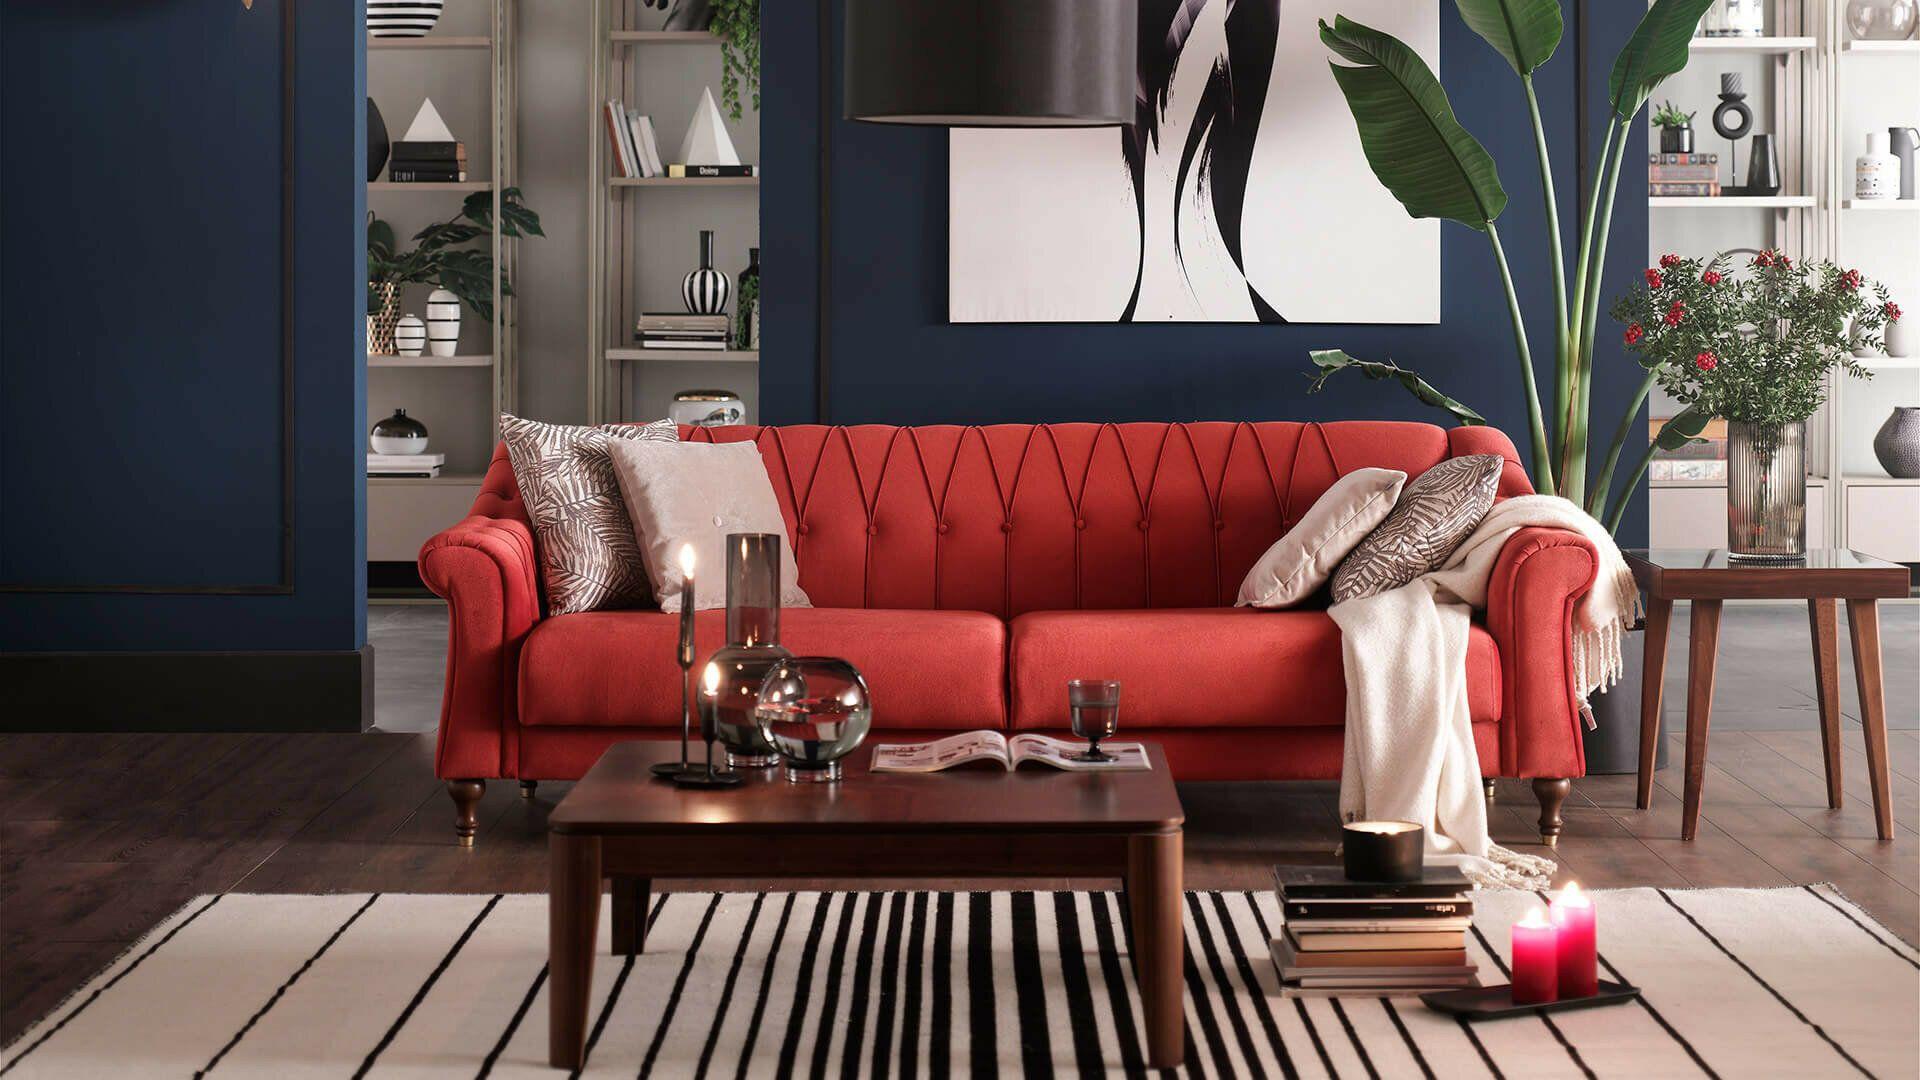 Dogtas Laura Uclu Yatakli Sandikli Koltuk Mobilya Decoration Homedecoration Furniture 2020 Ev Dekoru Dekor Mobilya